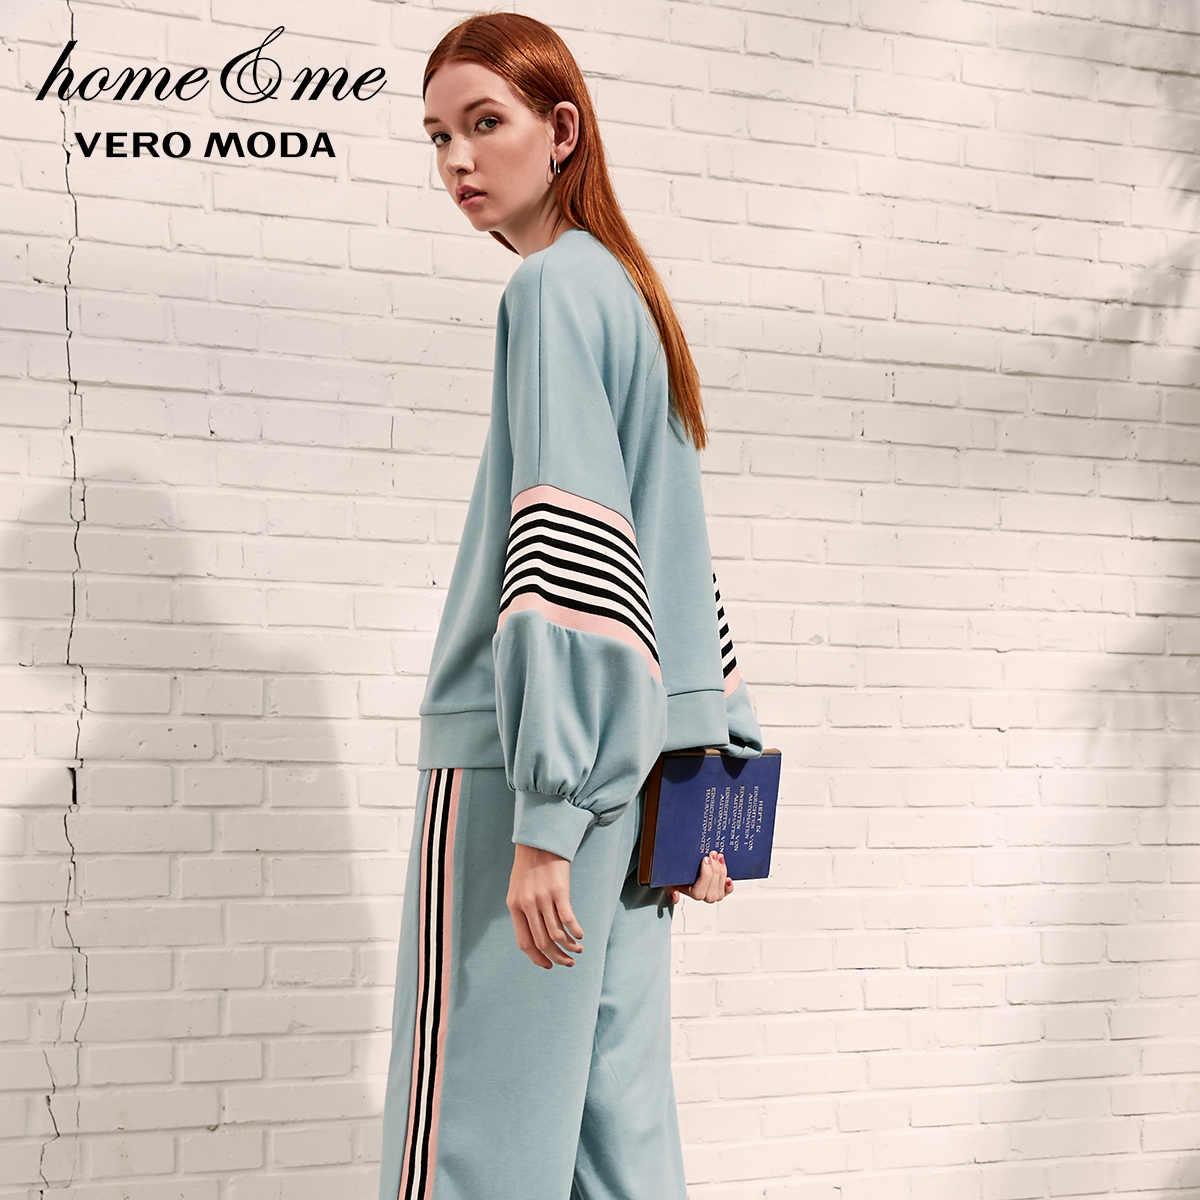 Vero Moda Women's Spring & Summer Long-sleeved Knitted Sweatshirt Hoodies Tops | 3184R3505